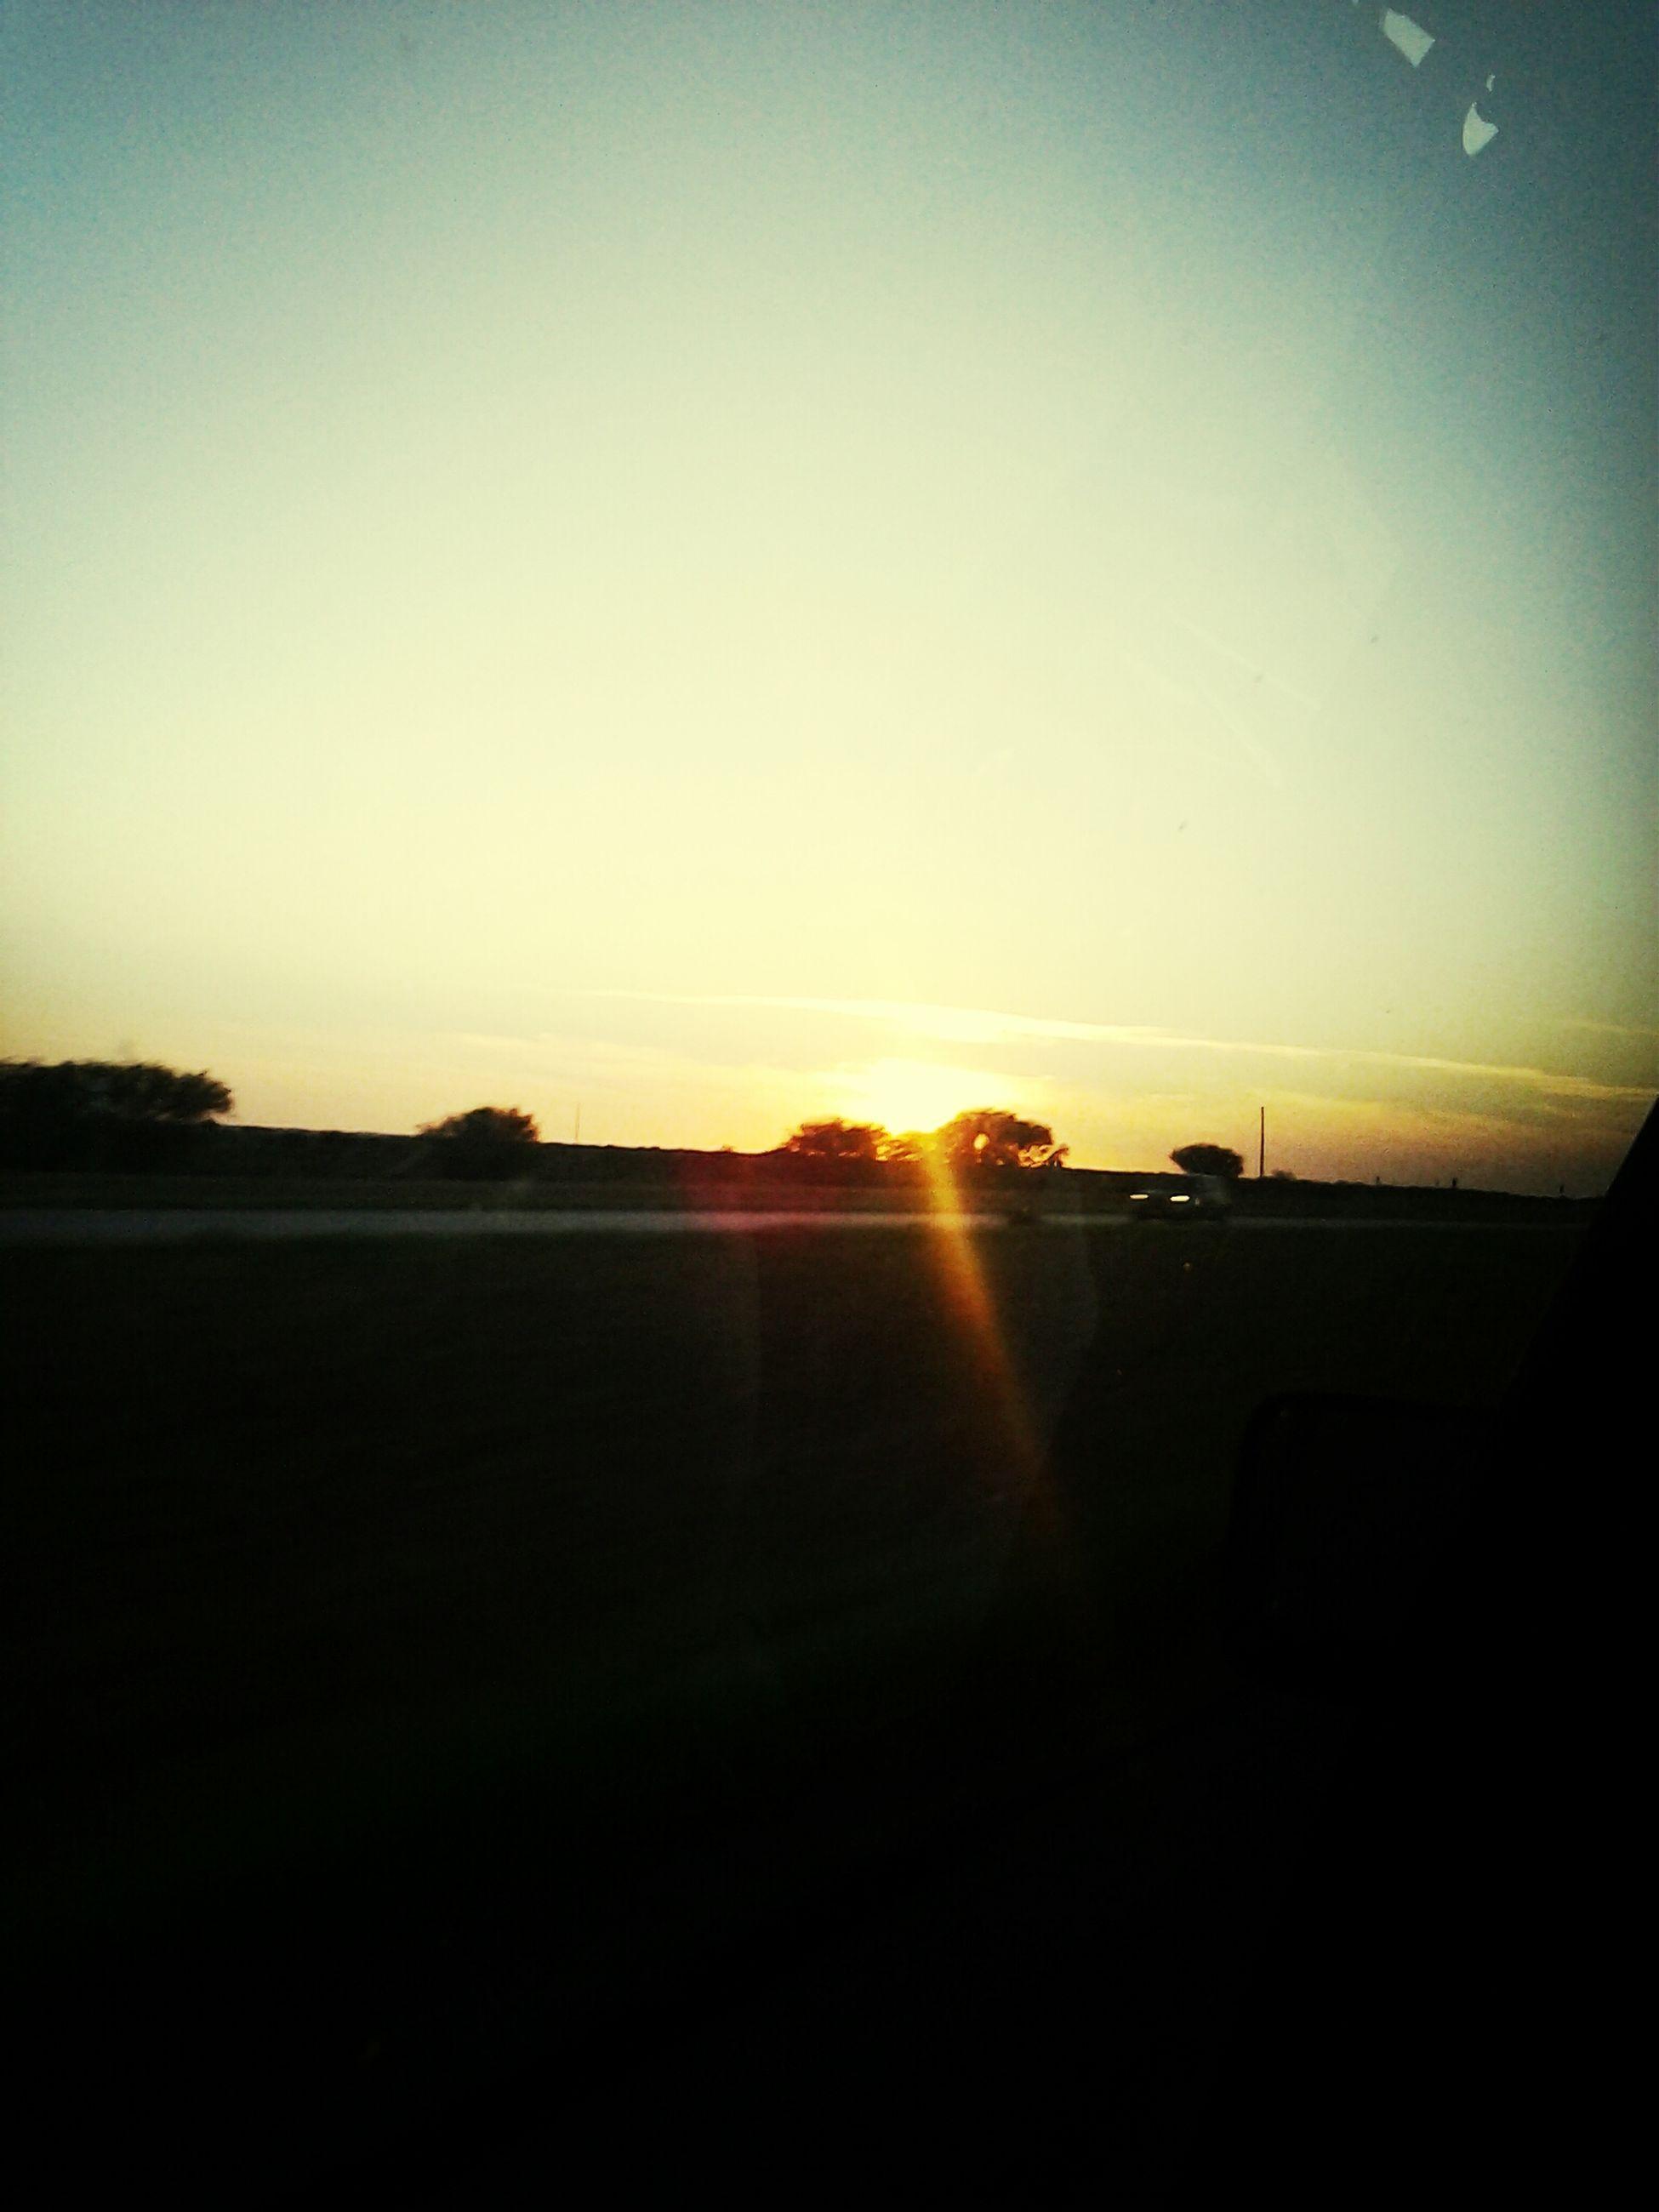 sunset, sun, silhouette, copy space, clear sky, sunlight, scenics, tranquil scene, tranquility, beauty in nature, sunbeam, orange color, nature, lens flare, sky, idyllic, outdoors, landscape, no people, dark